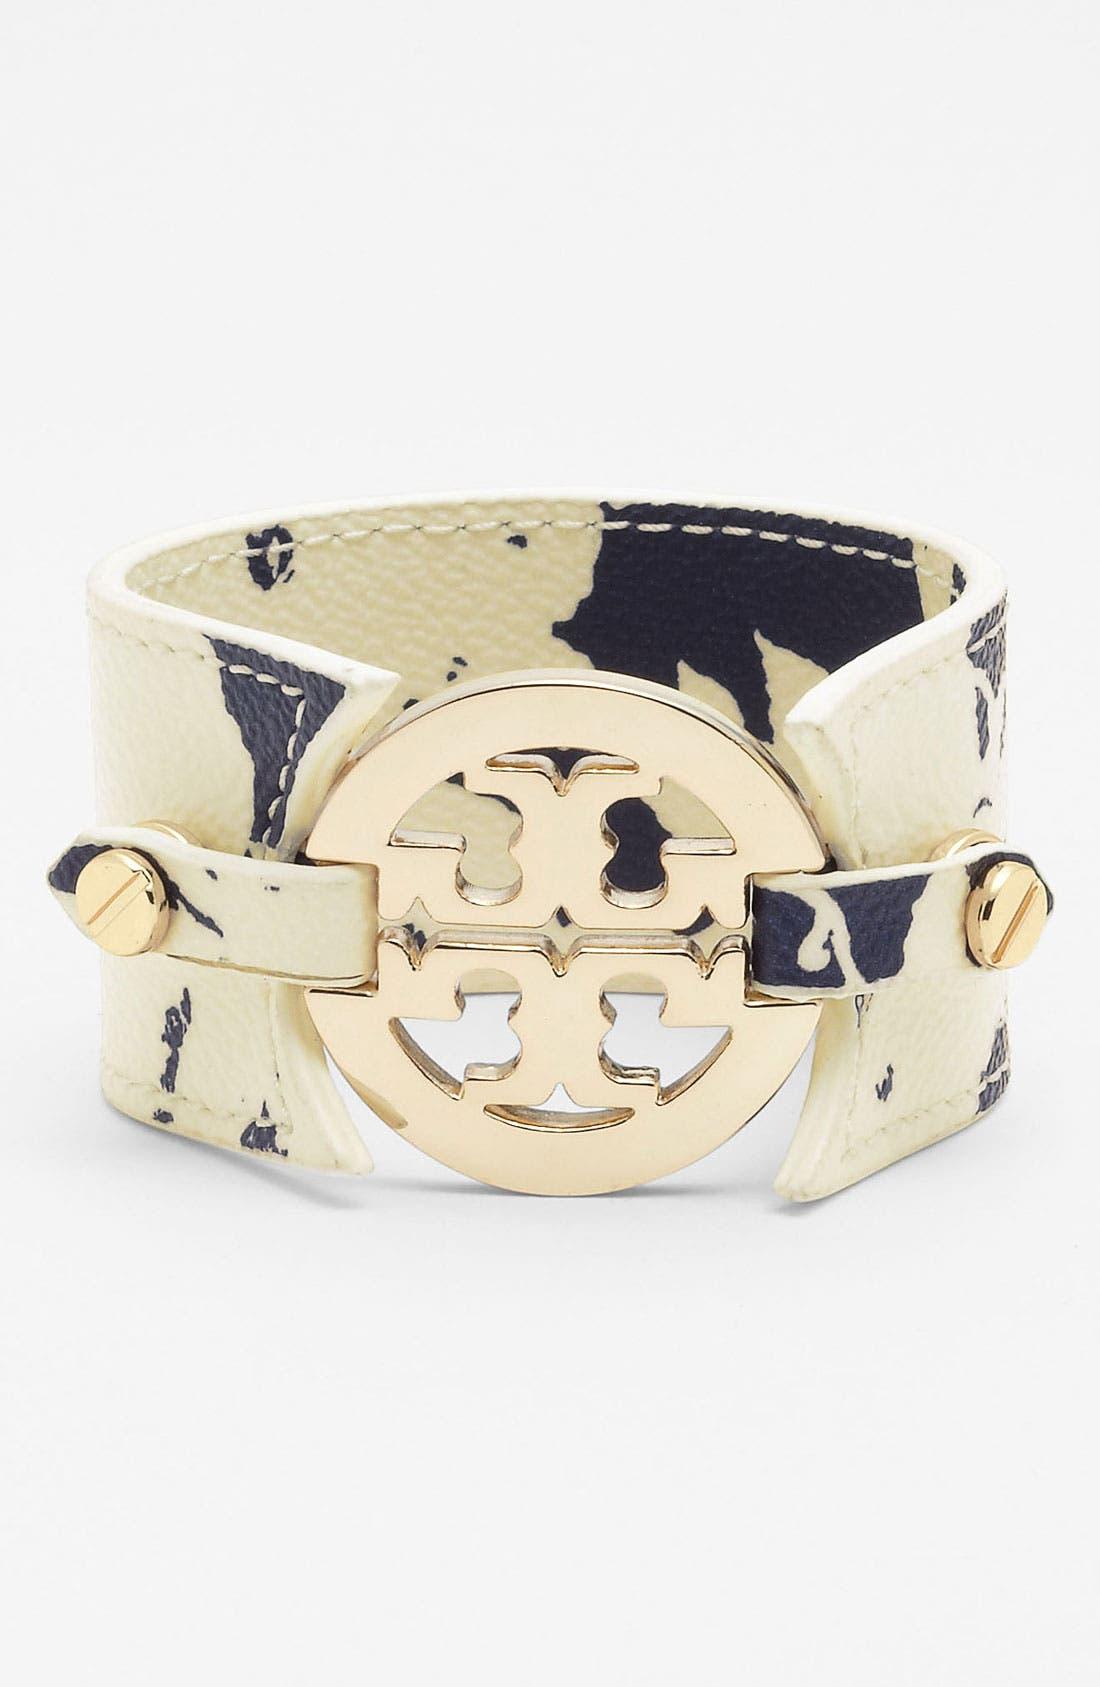 Alternate Image 1 Selected - Tory Burch 'Large' Print Leather Bracelet